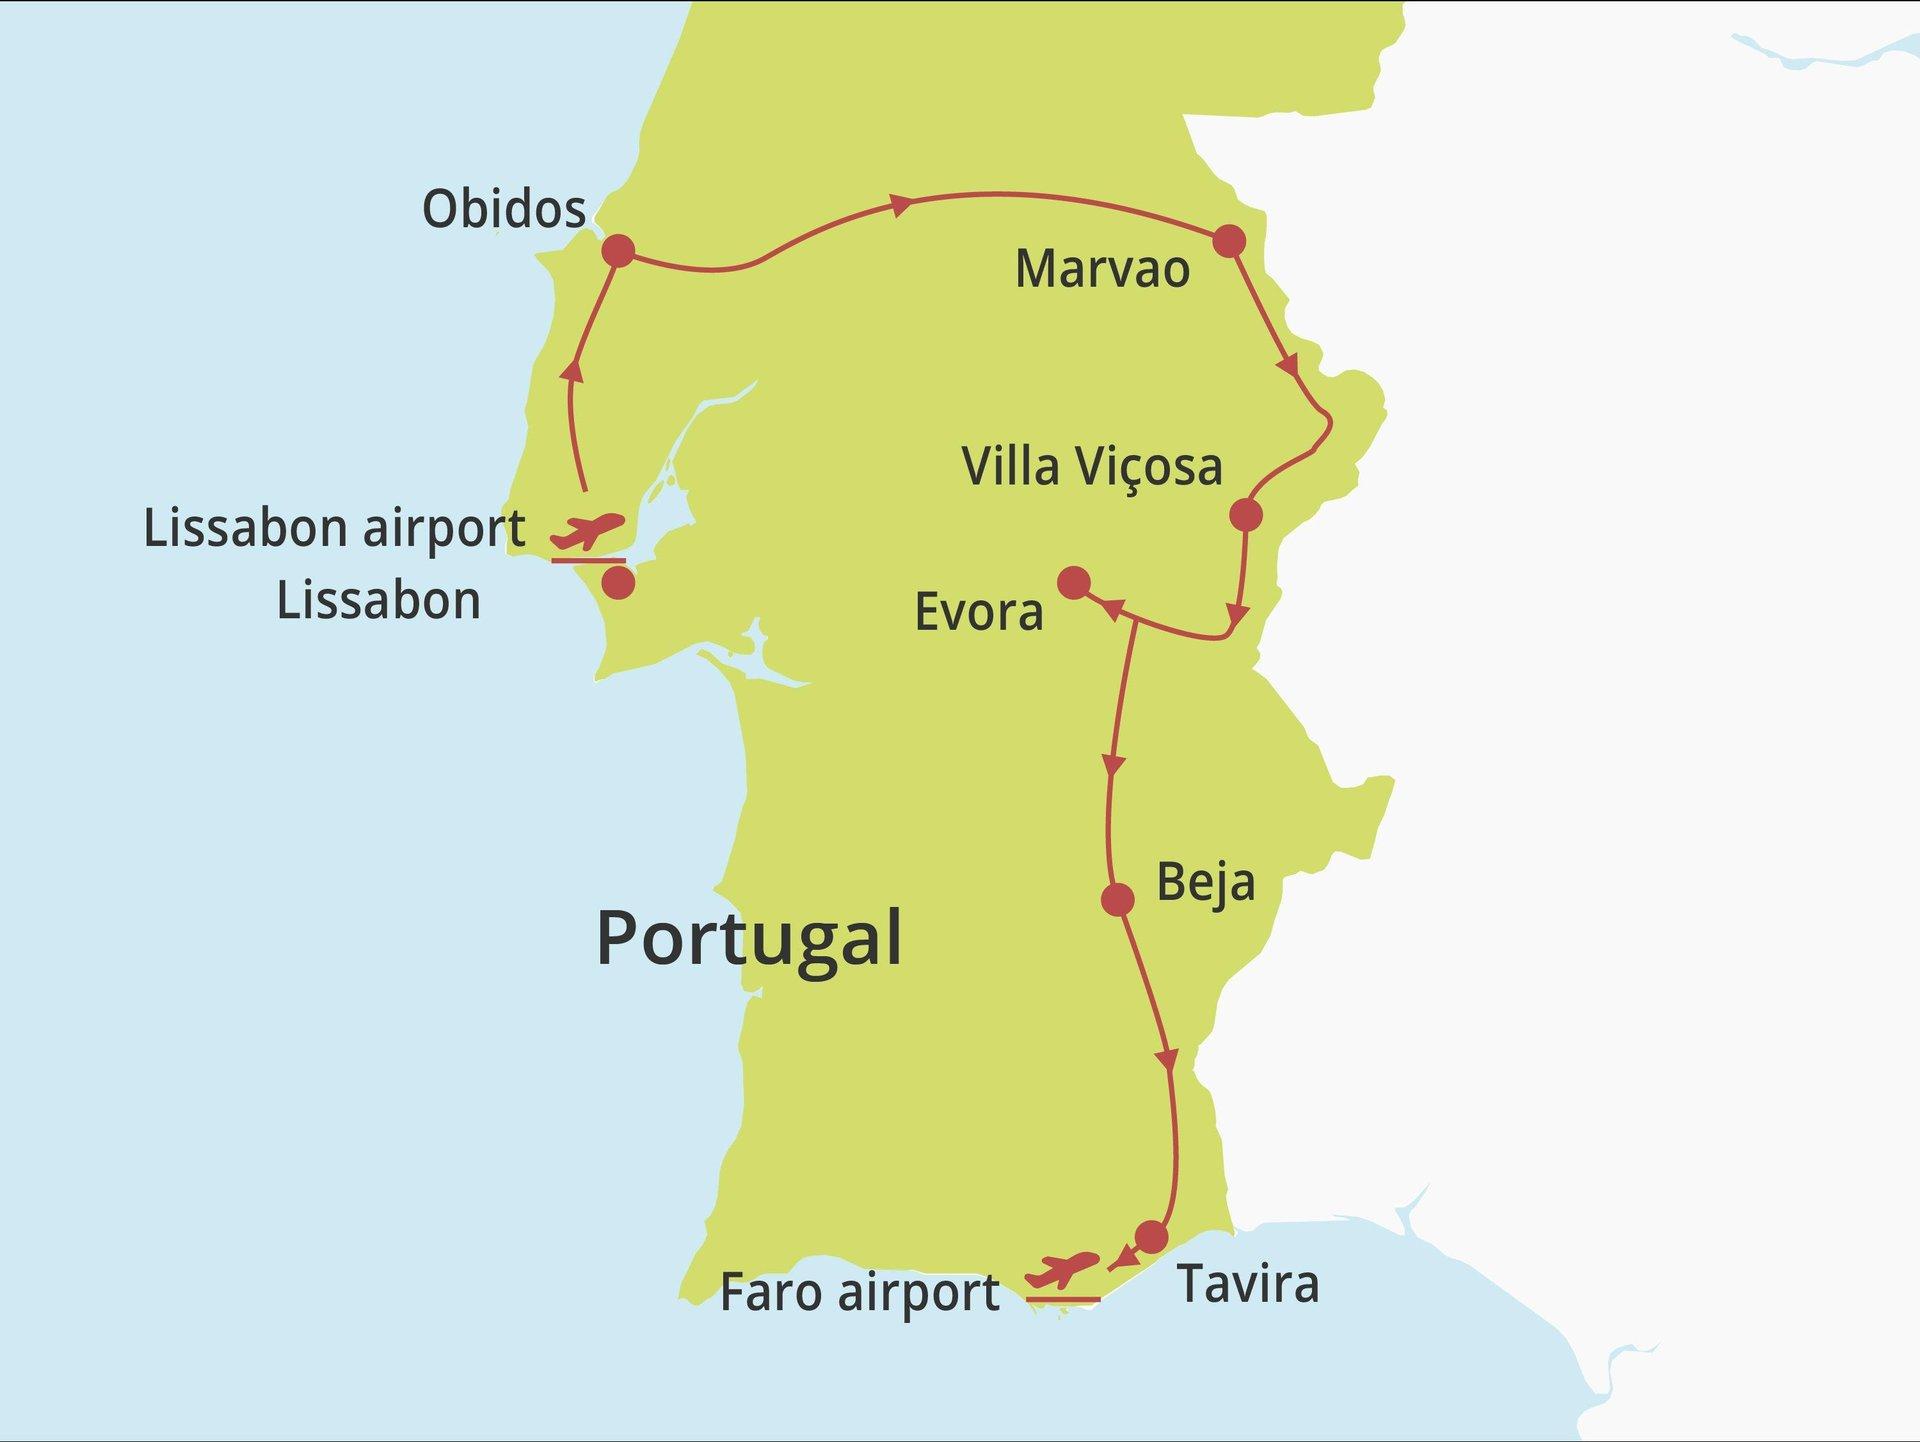 Fly-drive Lissabon kust, Alentejo en Algarve (pousadas) 11 dagen